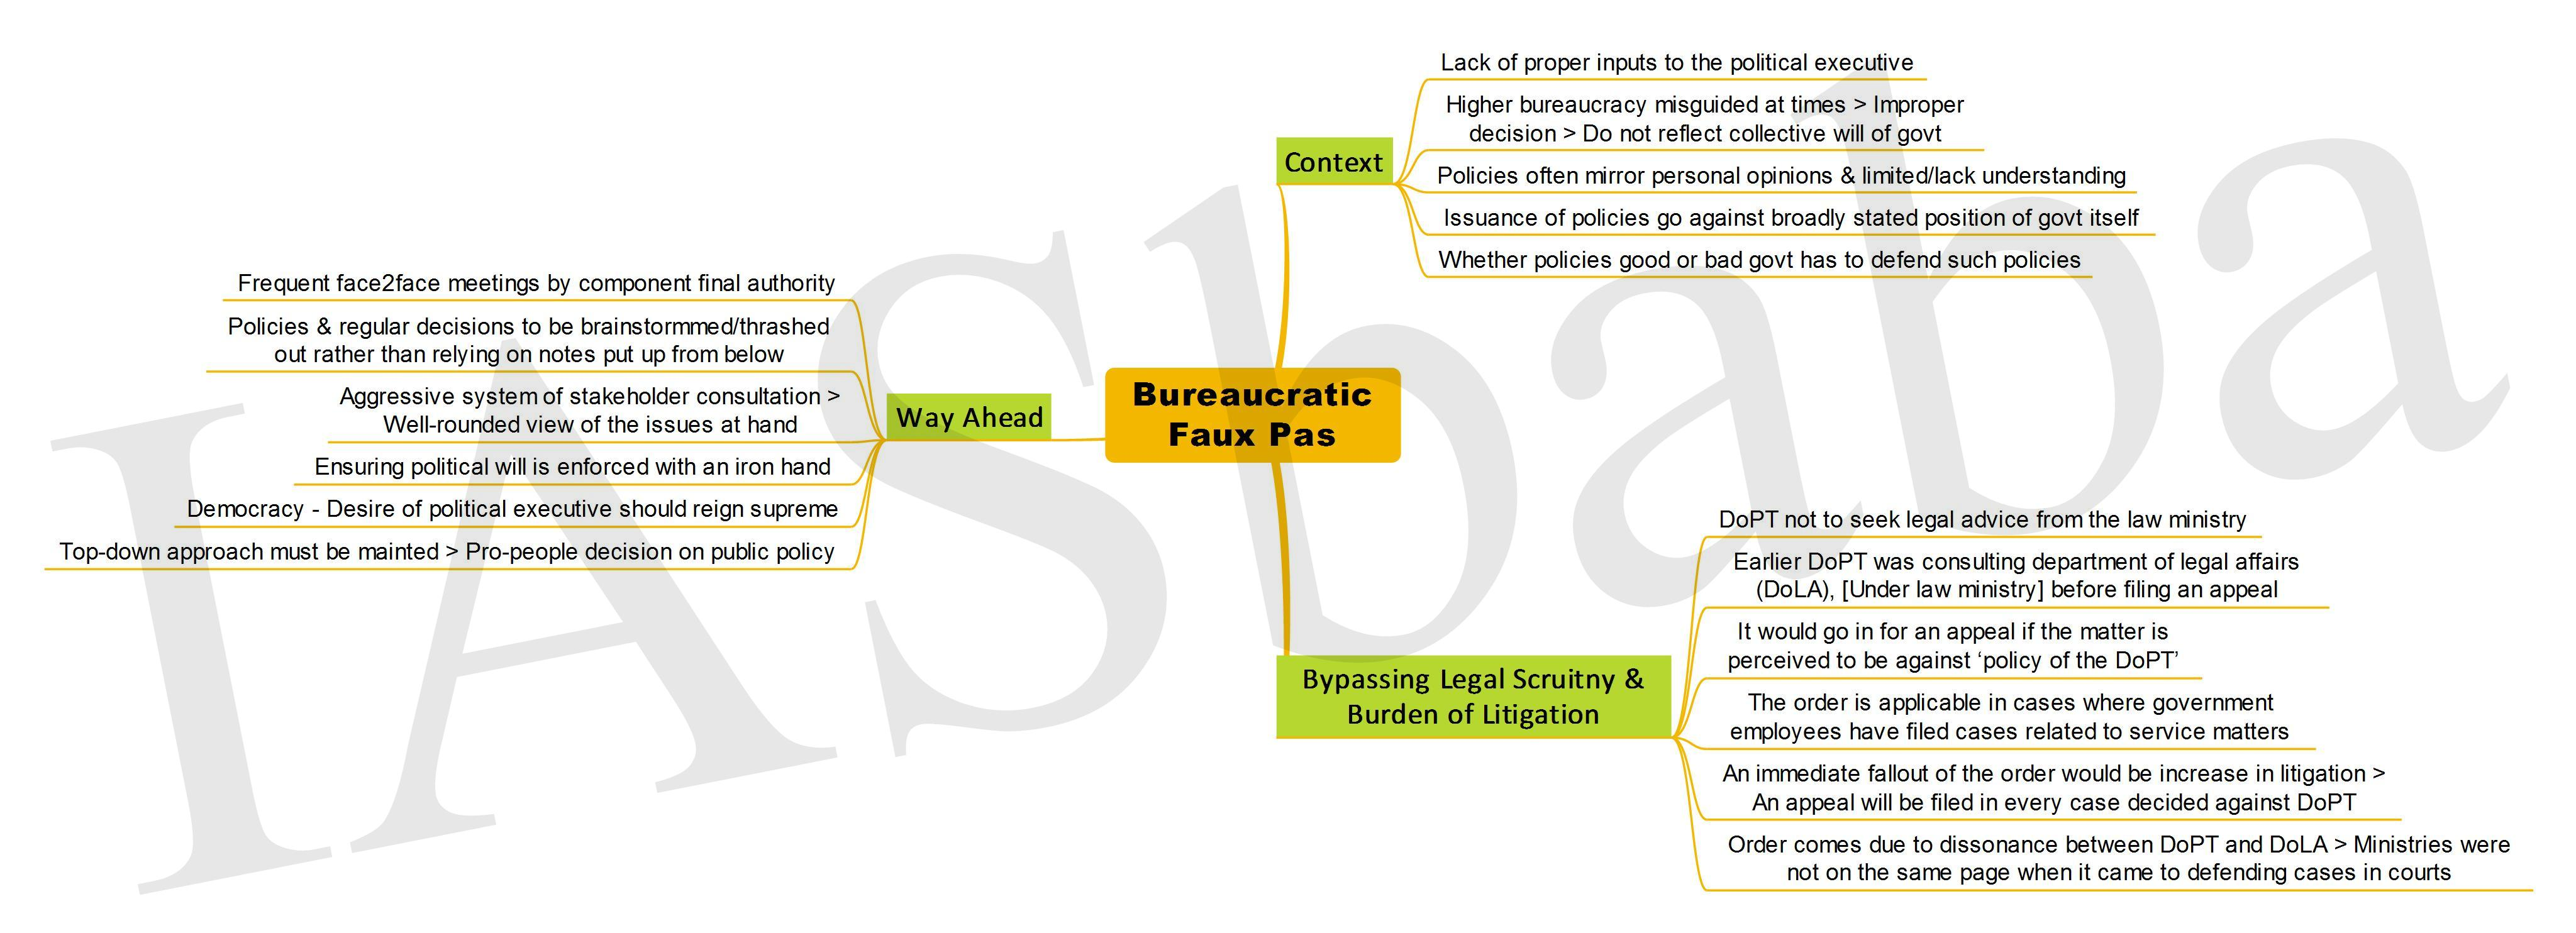 Bureaucratic Faux Pas - IASbaba